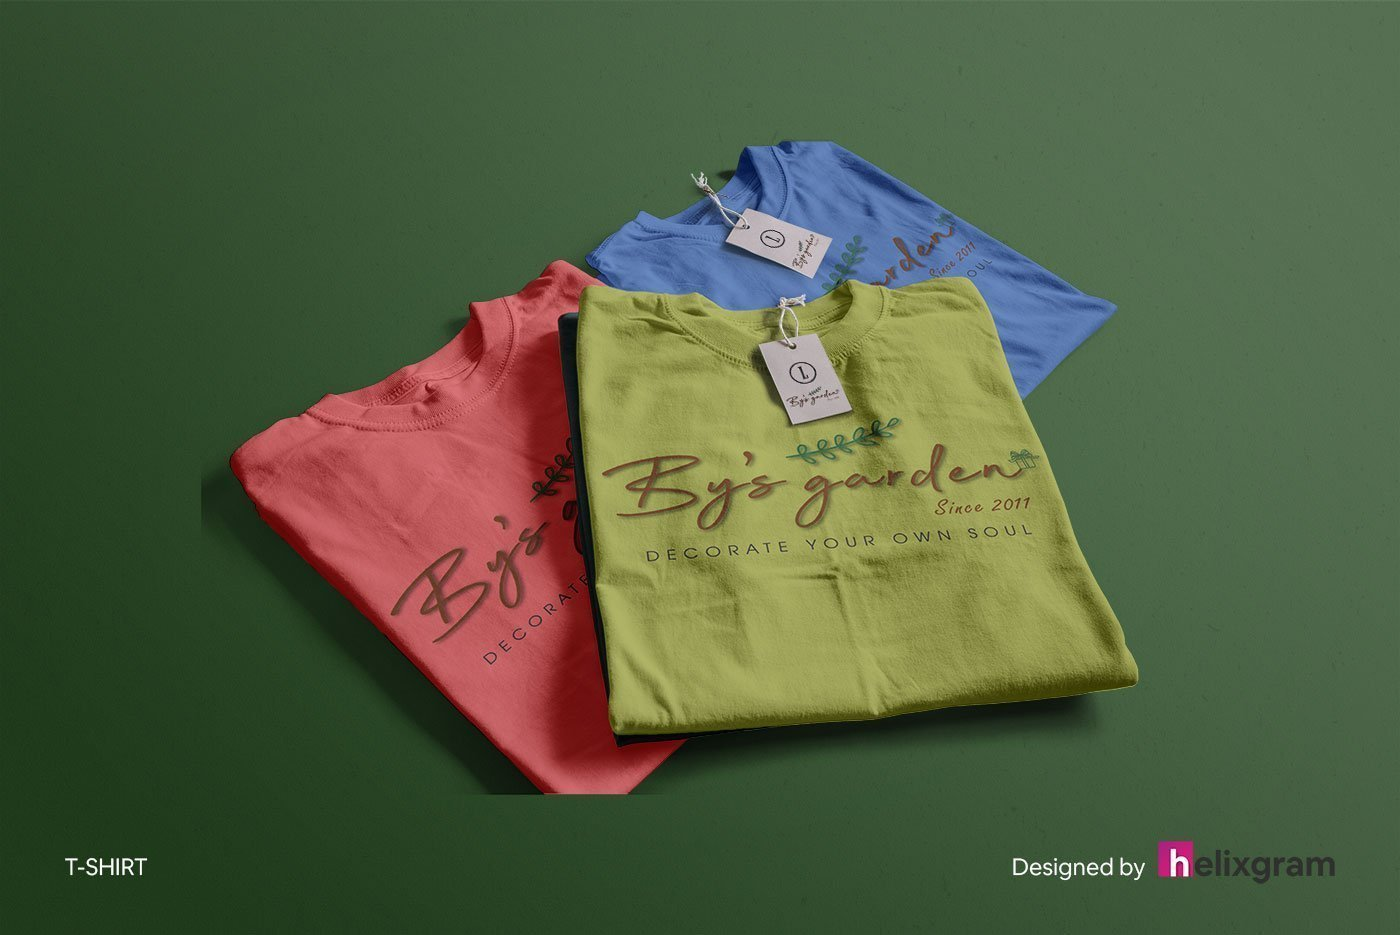 Brand-Identity-Design-Apparel-T-shirt-By's-Garden-visual-identity-design-package-corporate-identity-design-logo-design-flyer-poster-book-cover-design-web-design-digital-advertising-design-Helixgram